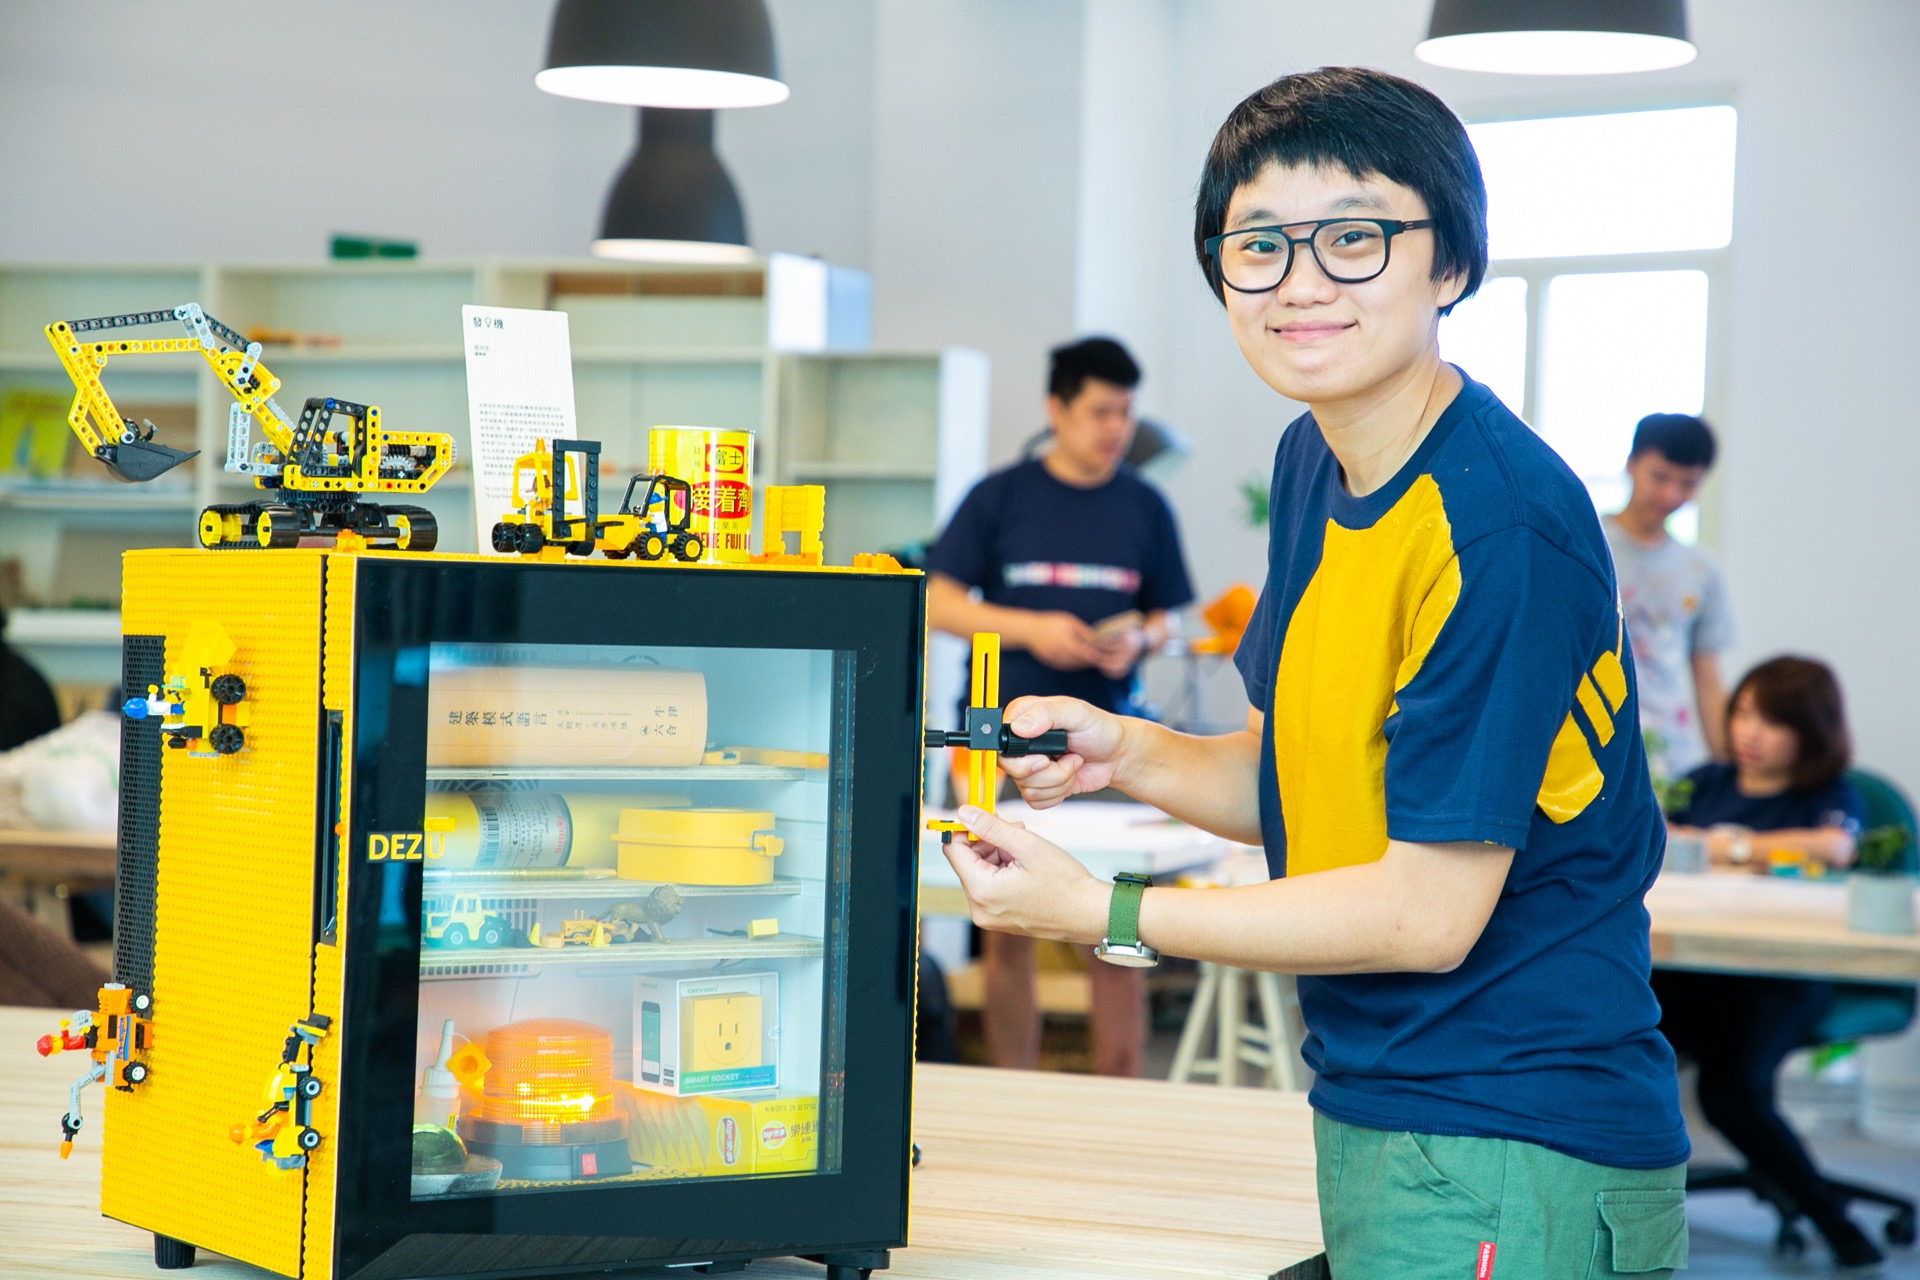 德築-DEZU-project-cooler-design-game-refrigerator-create-12